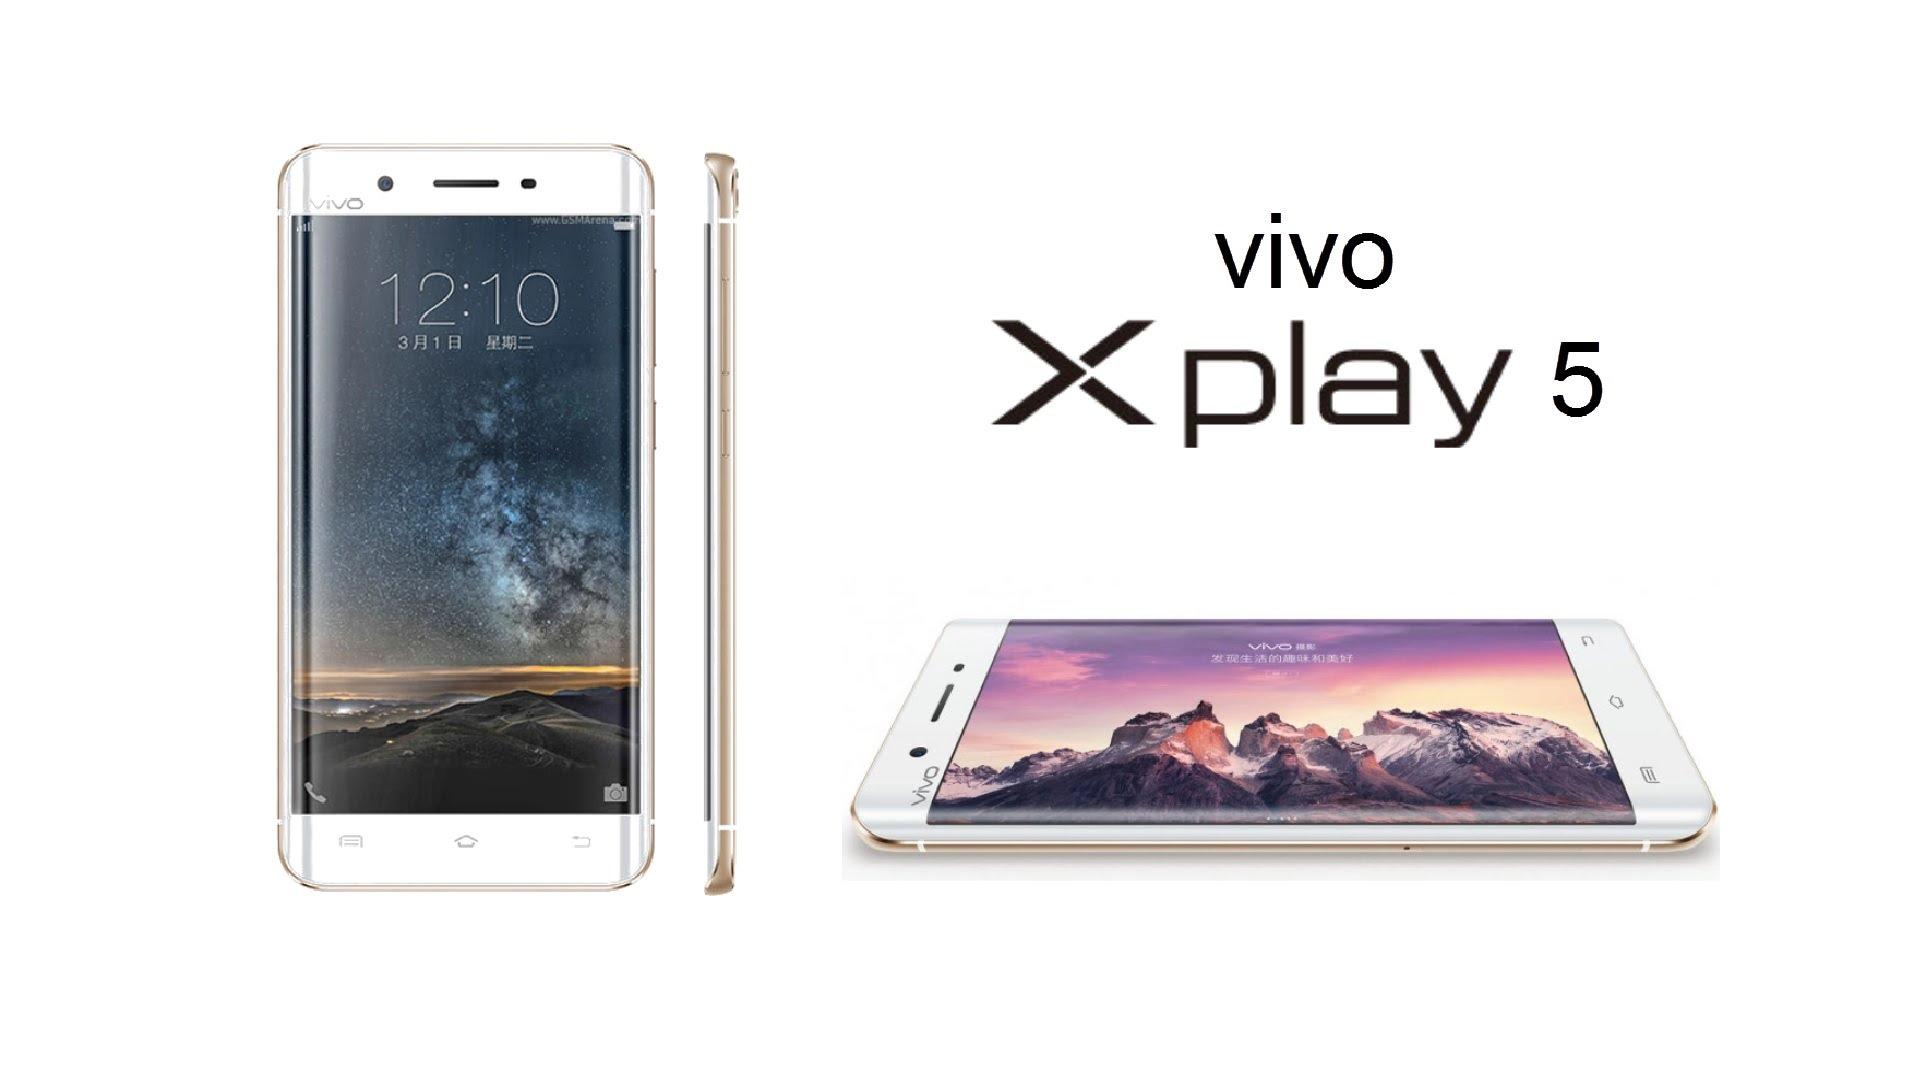 Vivo Xplay 5 2